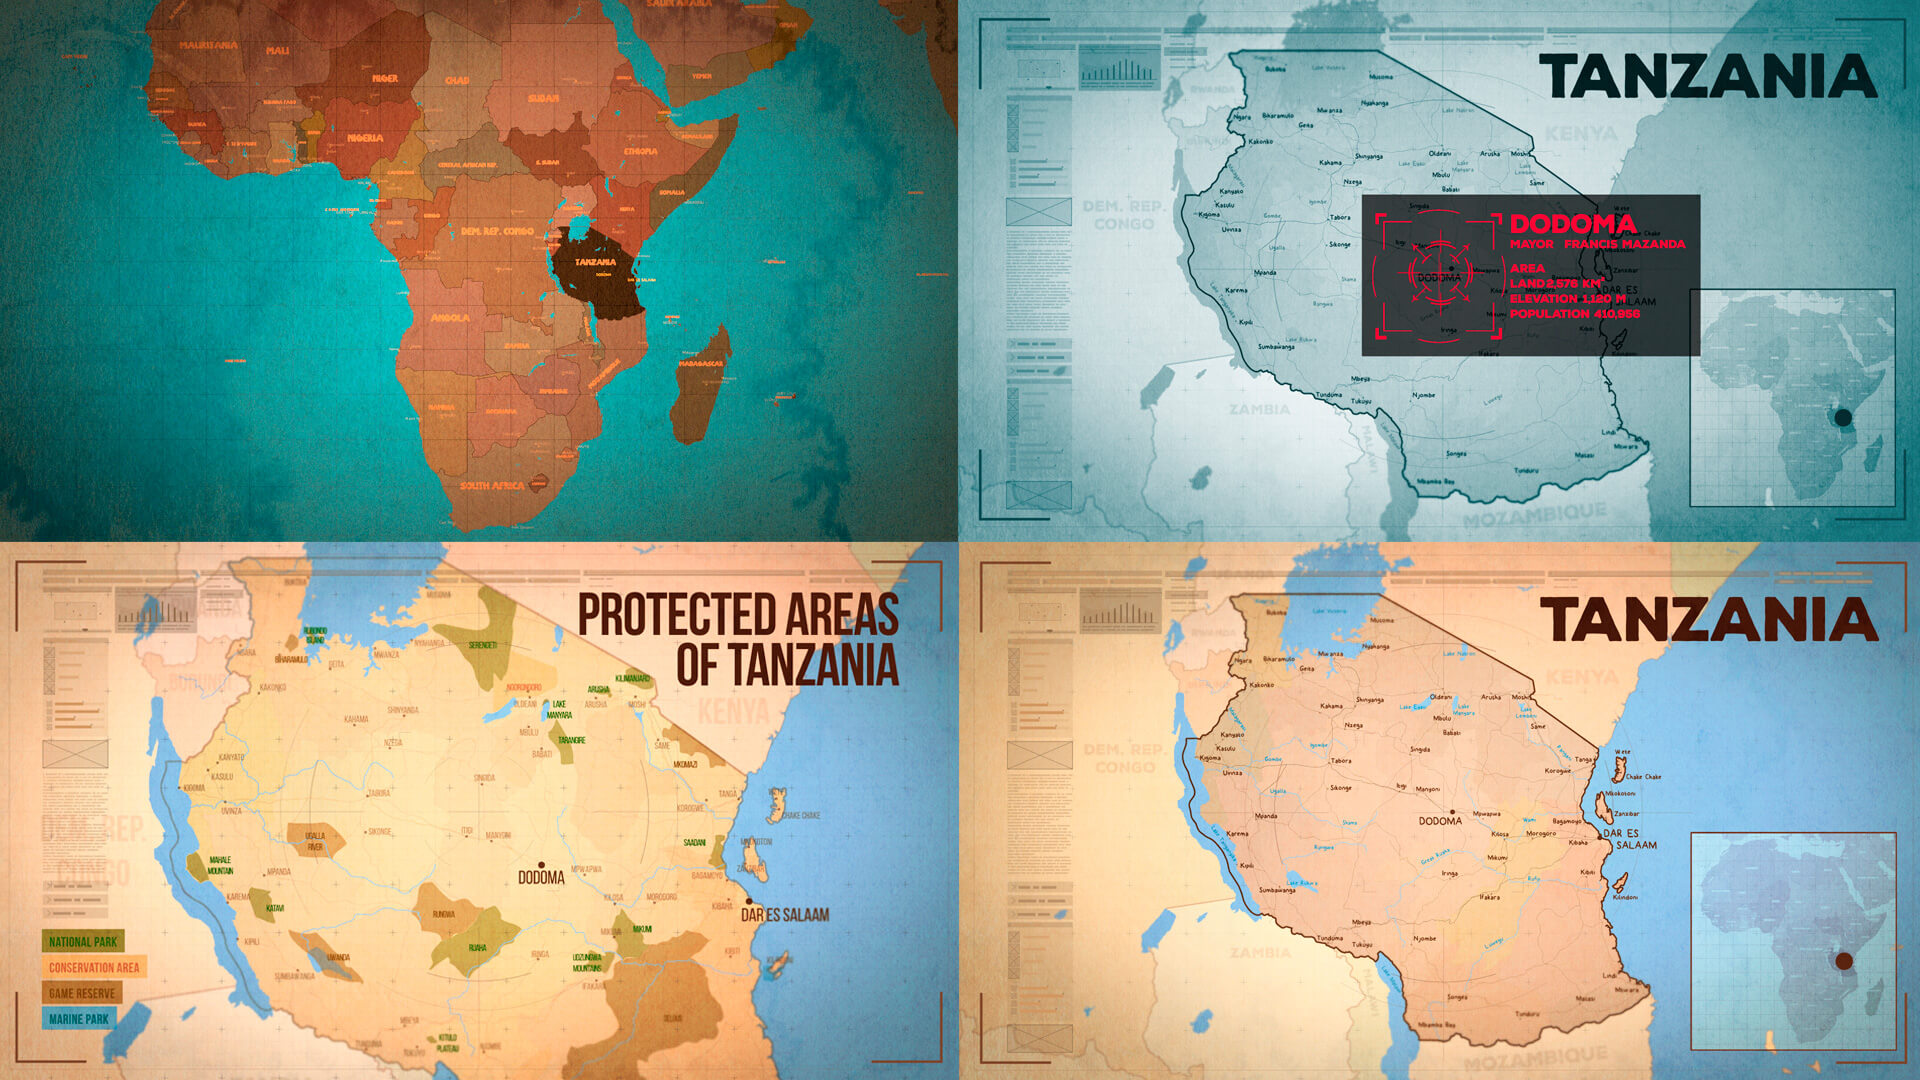 Tanzania_Map_A2 (0.00.00.00)_3